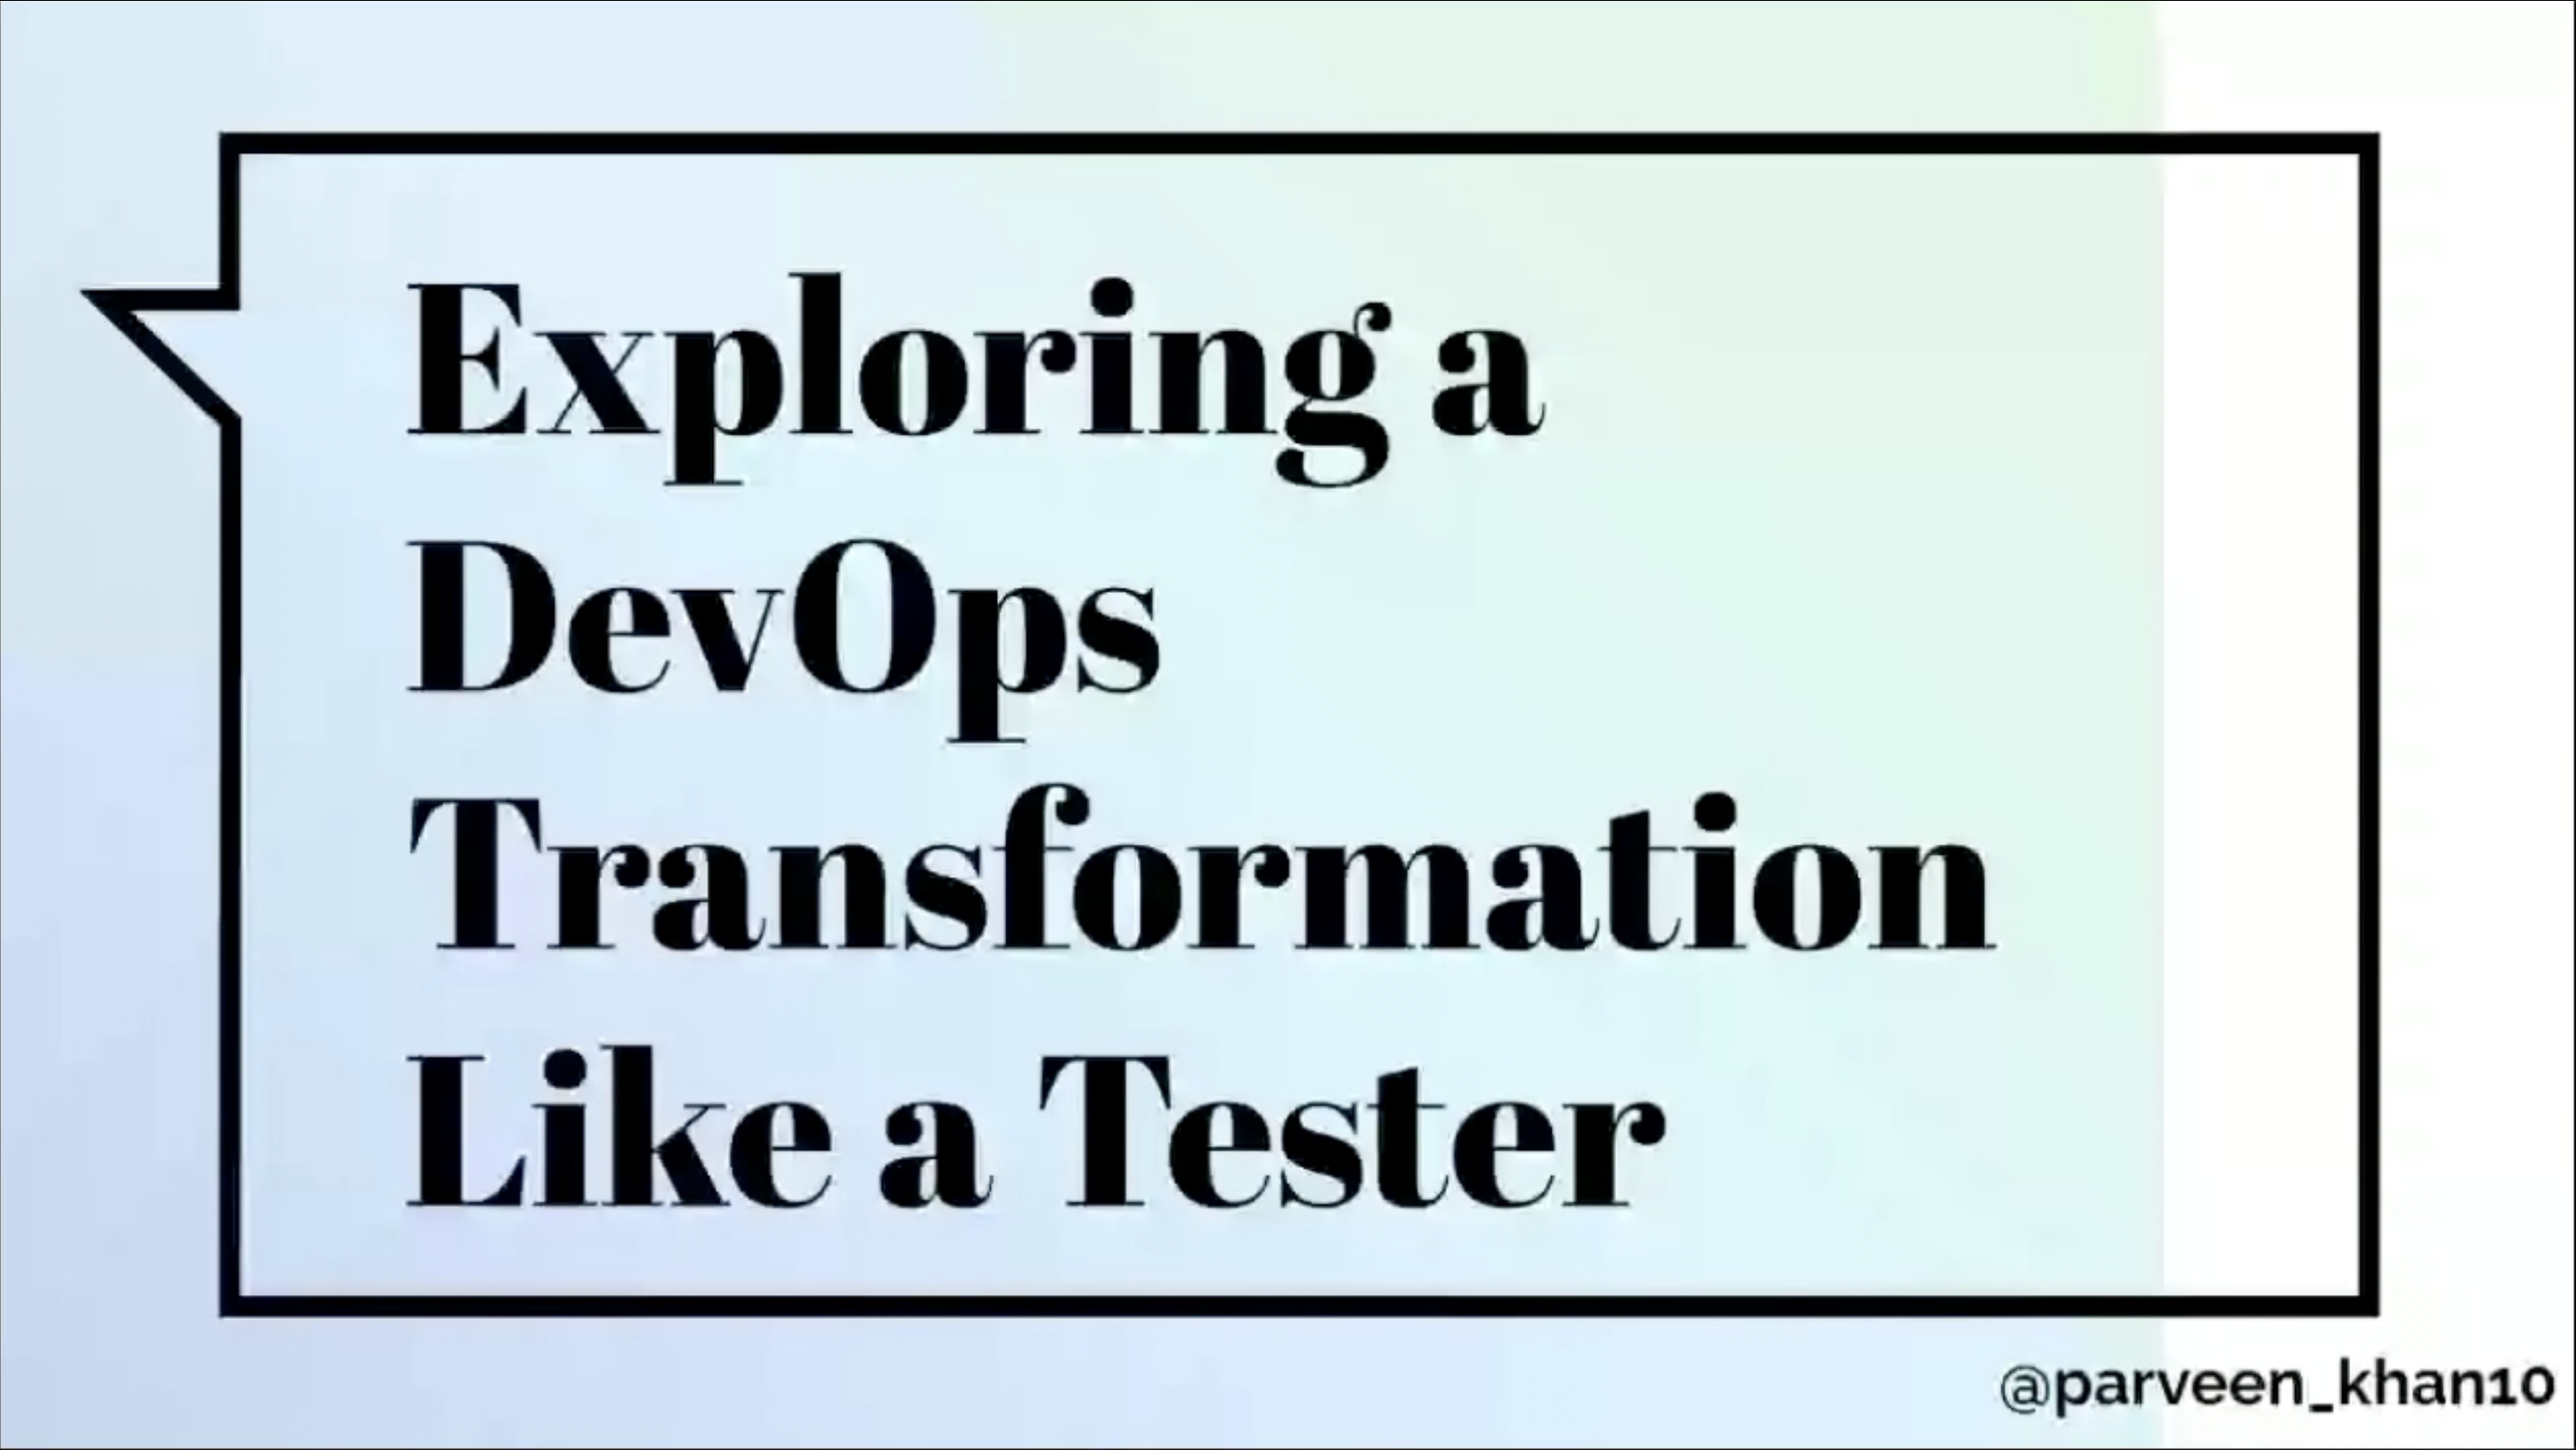 Exploring DevOps Like a Tester by Parveen Khan